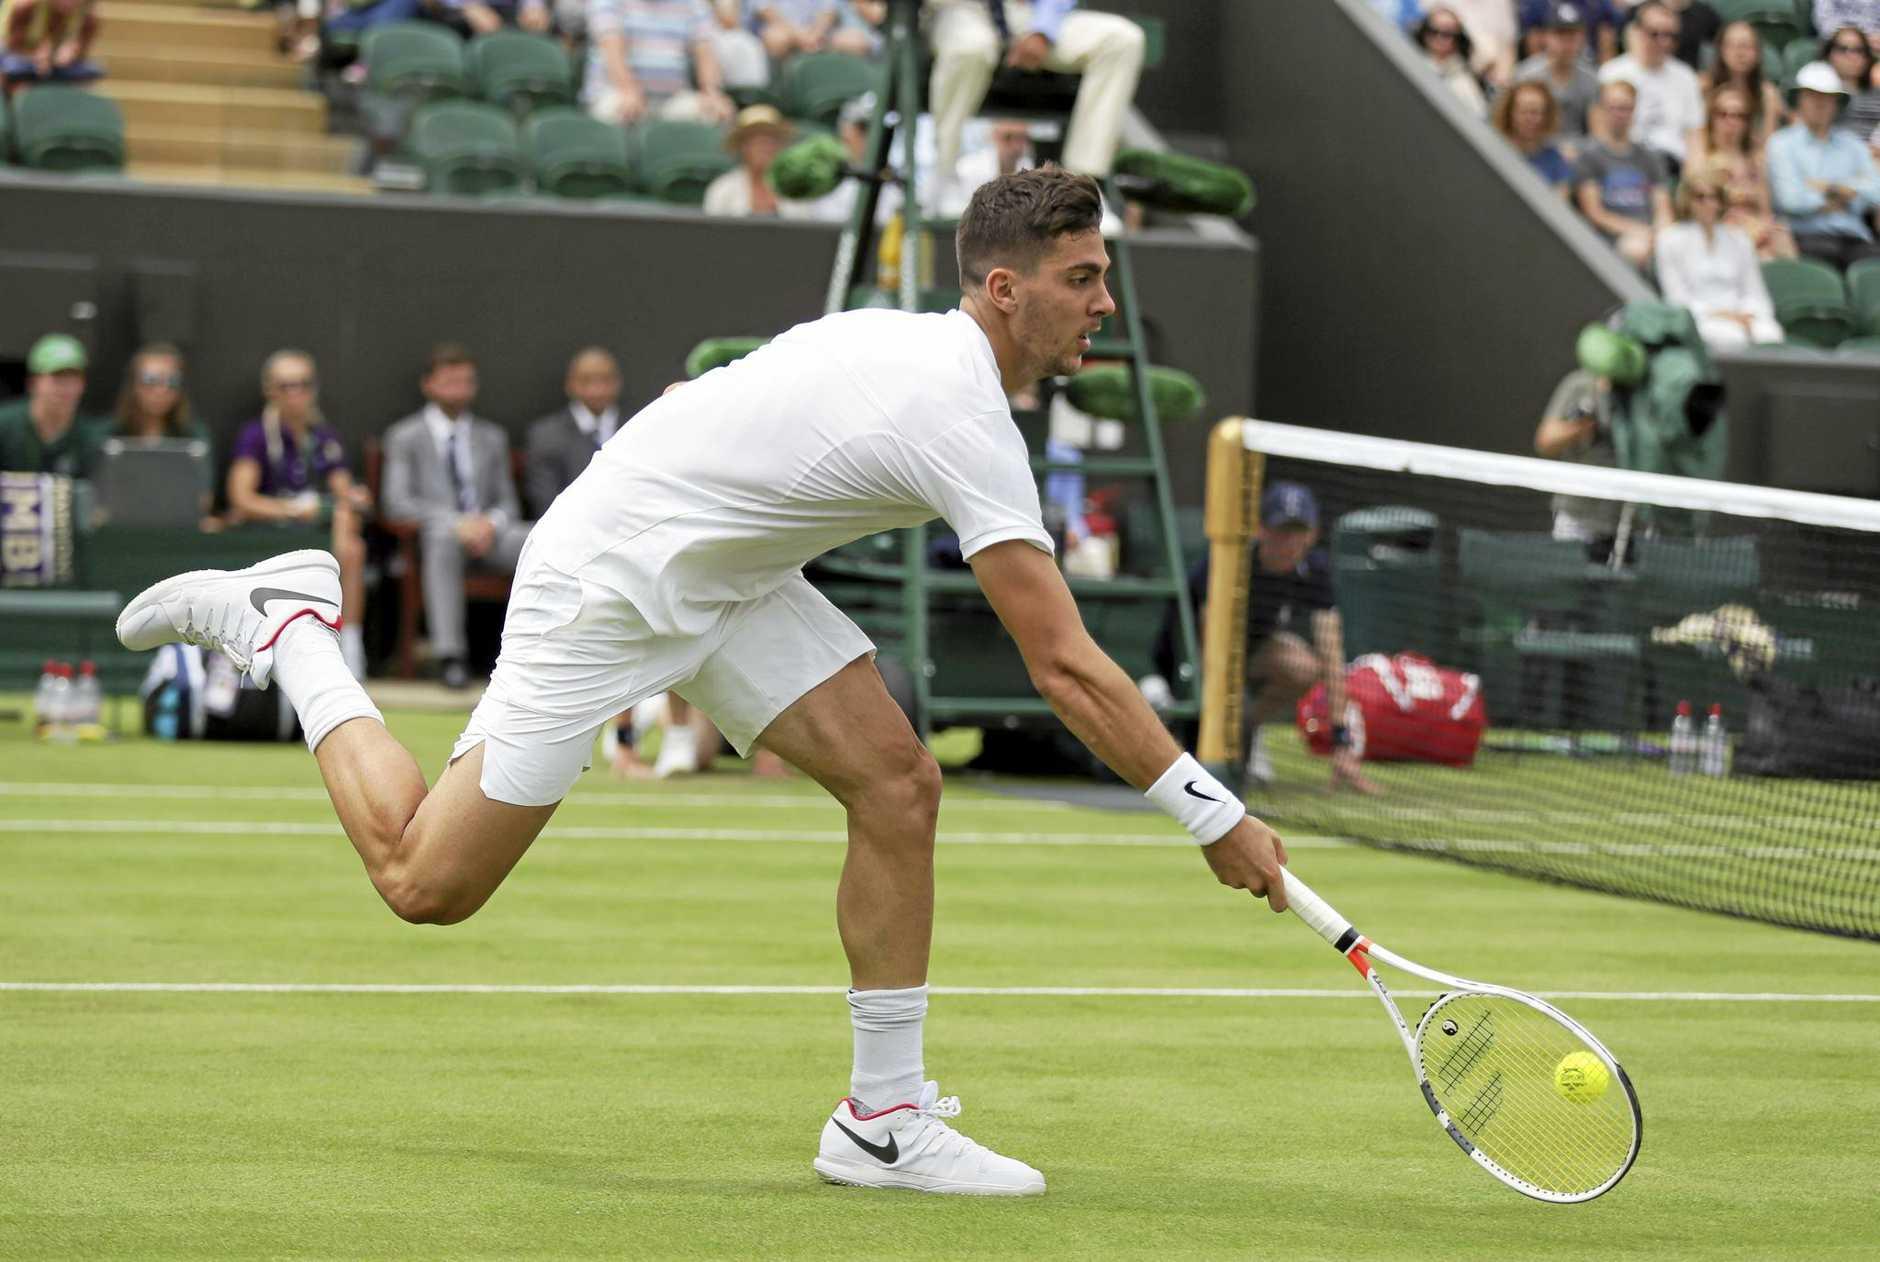 Australia's Thanasi Kokkinakis lost 6-3 3-6 7-6 (7-2) 6-4 loss to US Open winner Juan Martin del Potro in the first round of Wimbledon.